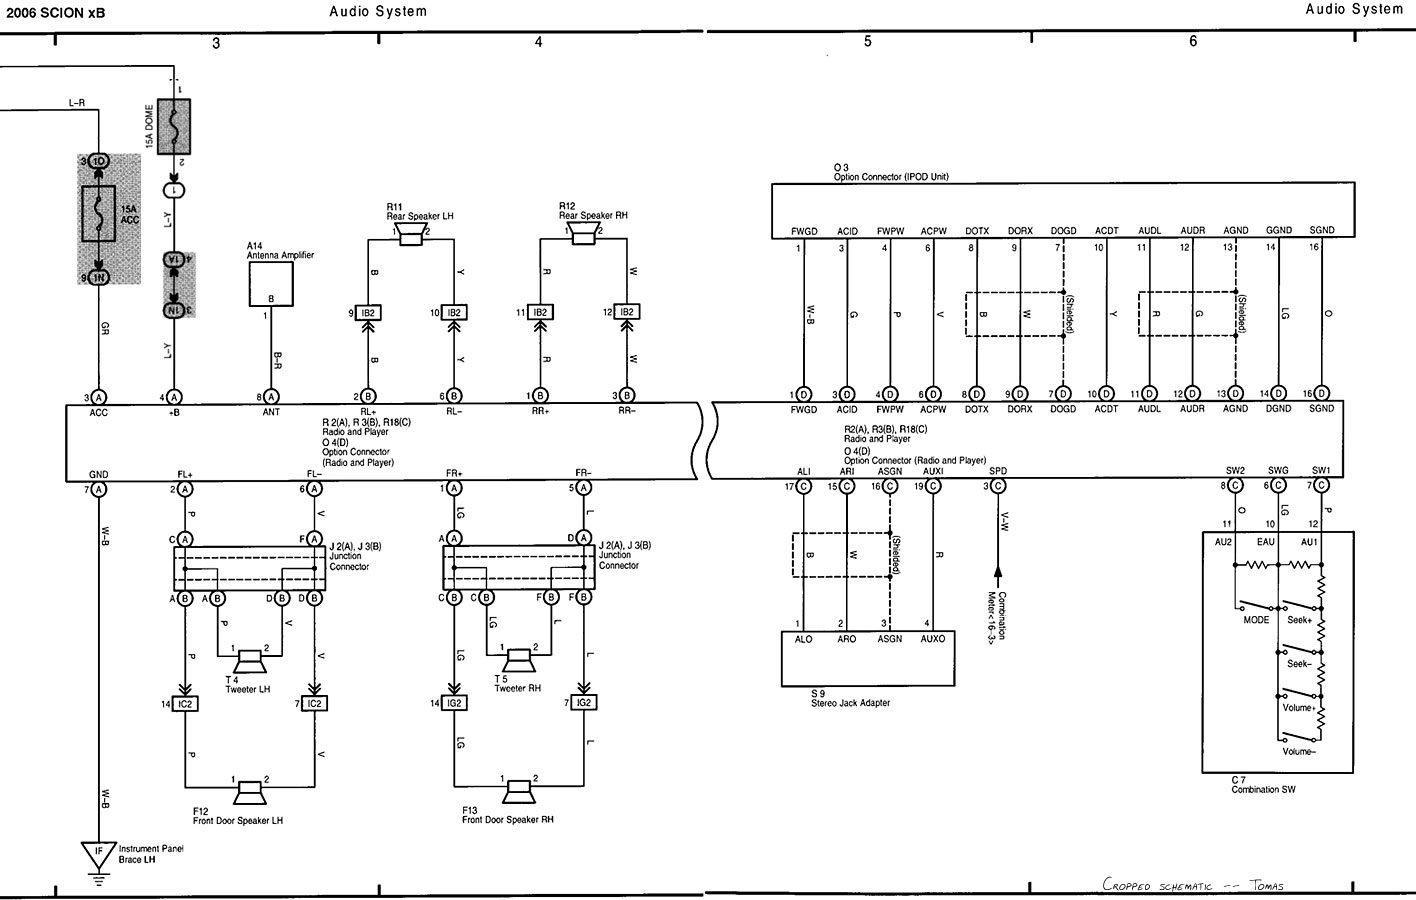 Amphicar Wiring Diagram 23 Images Diagrams Daewoo Matiz Radio Fuse 2005 Scion Tc Diagramt1508751668 Avs 7 Switch